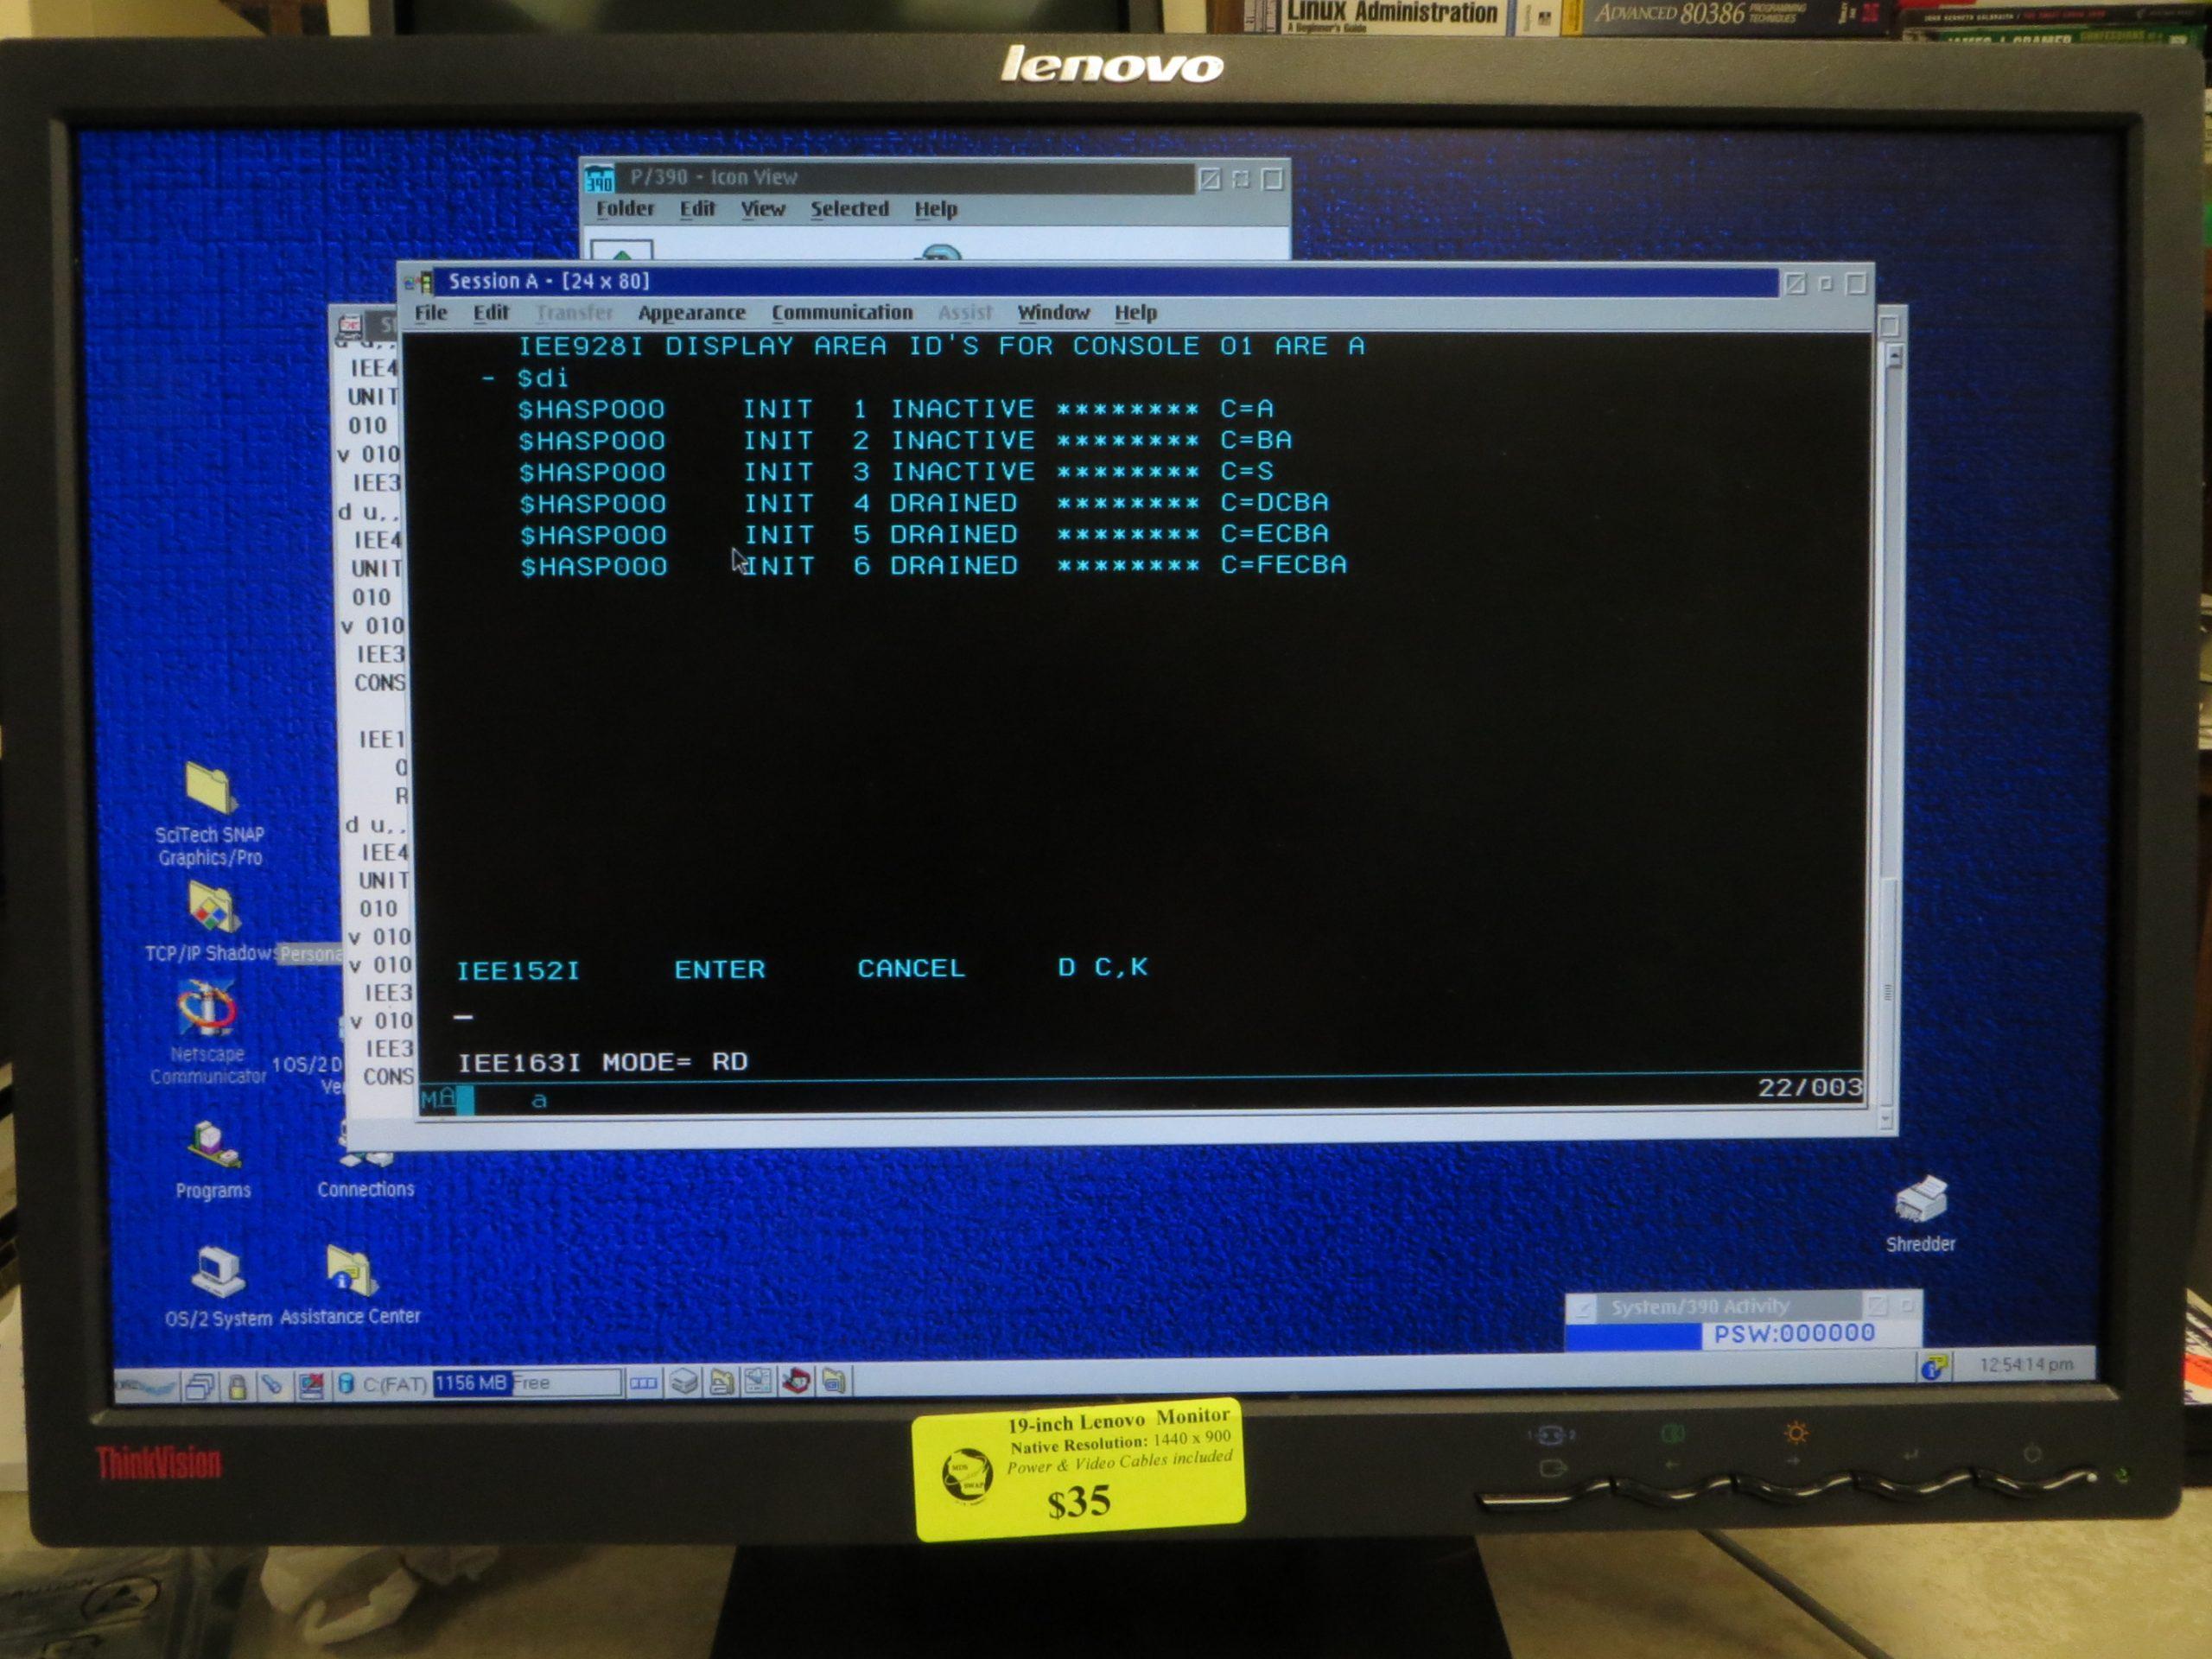 AMD 1.33 GHz Athlon PC P/390E MVS 3.8j 3270 Console